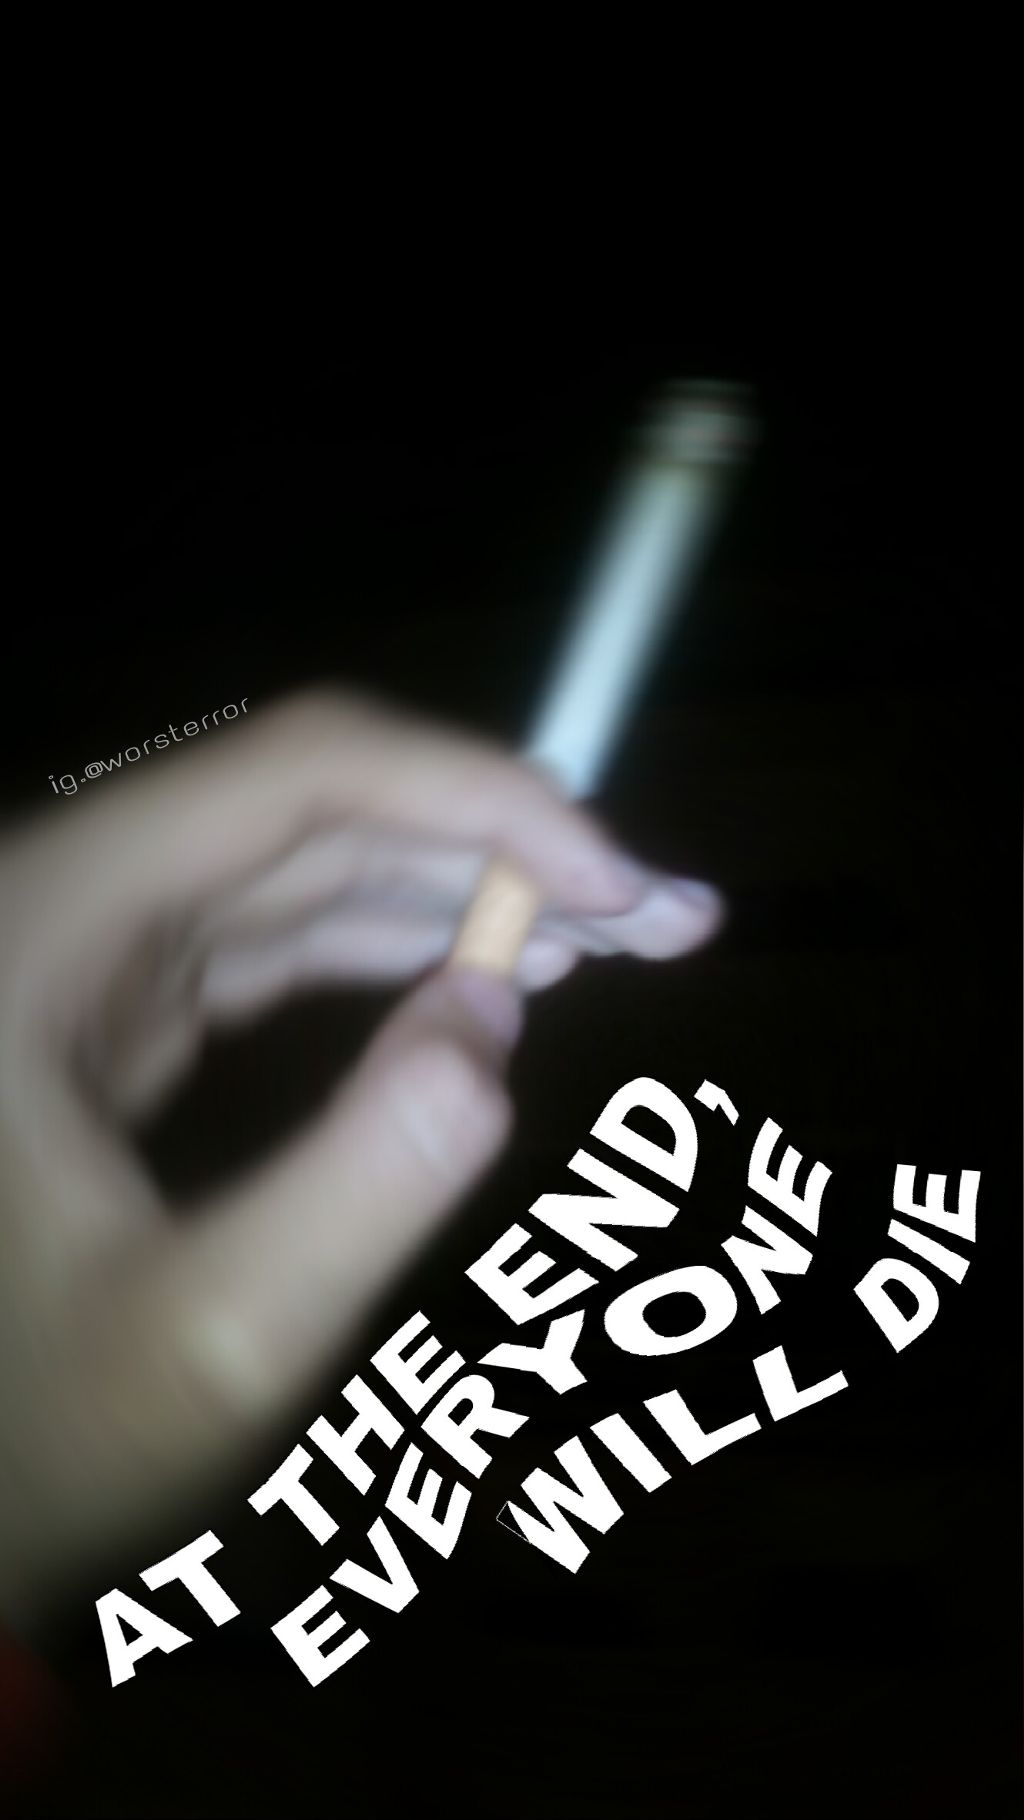 Tumblr Tumblrgirl Smoke Cigarette Cigarro Die Blackandw